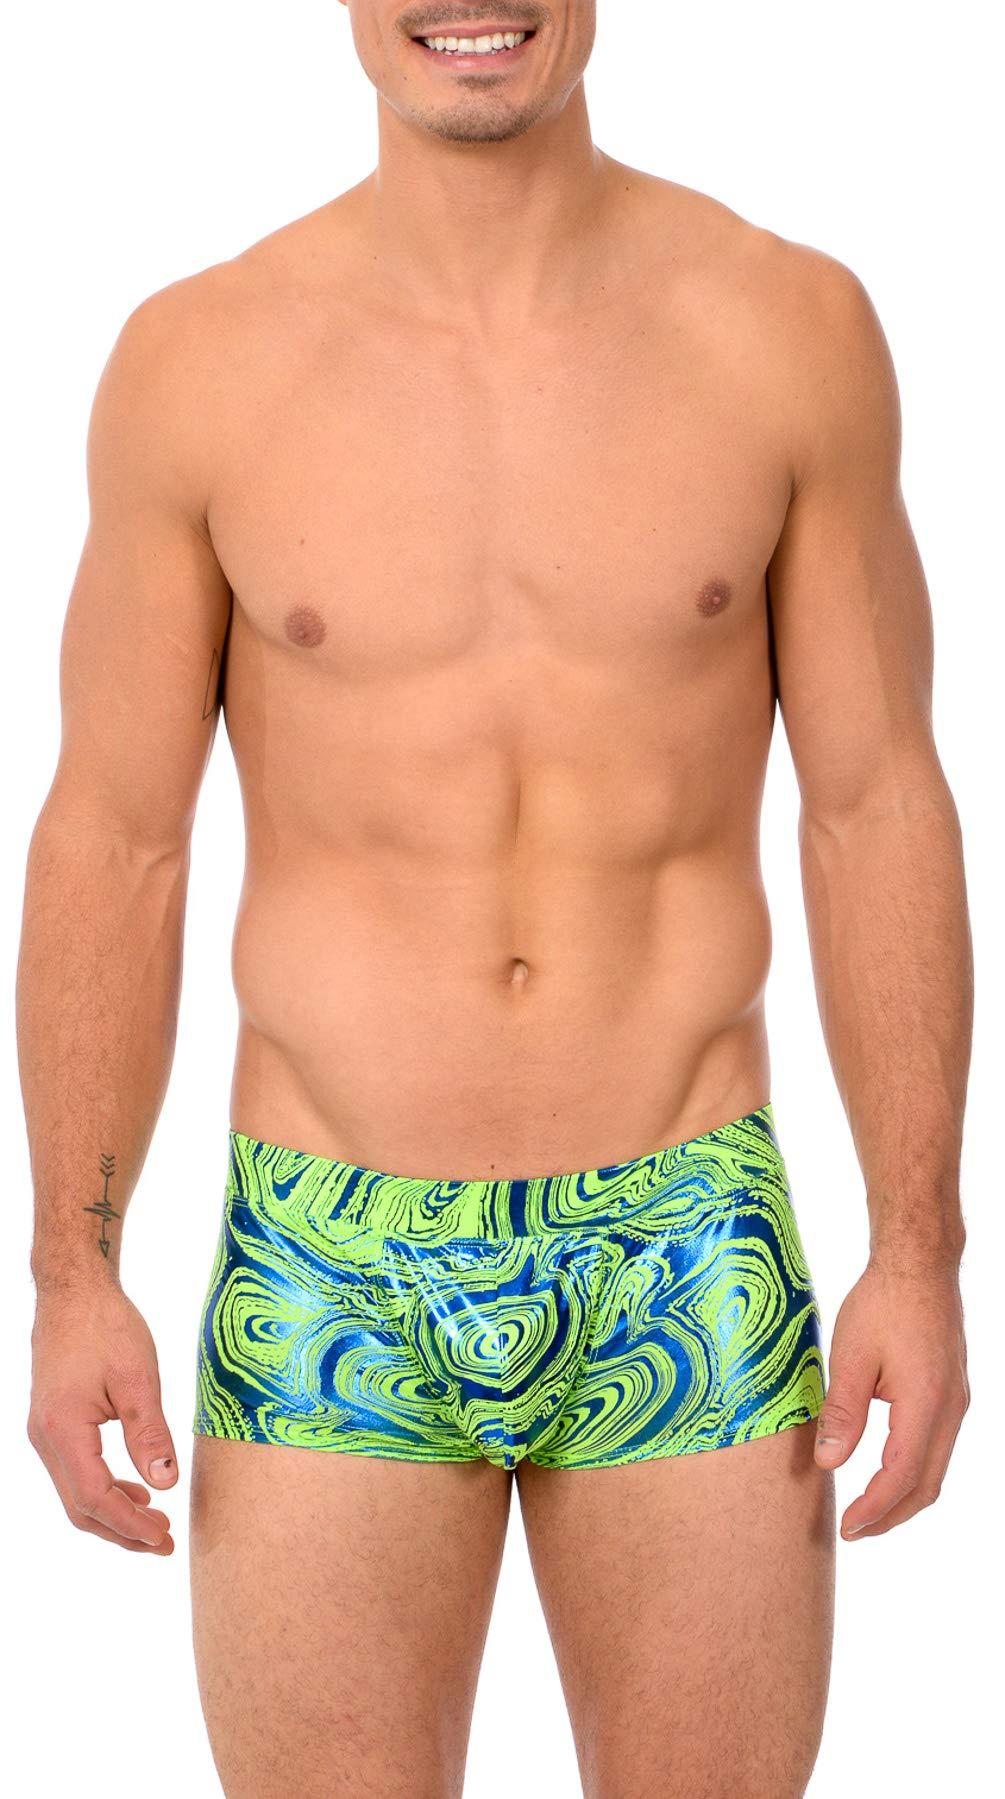 822e3147759 Galleon - Gary Majdell Sport Mens Print Contour Pouch Bikini Swimsuit  (X-Large, Lava_LIM_RYL)